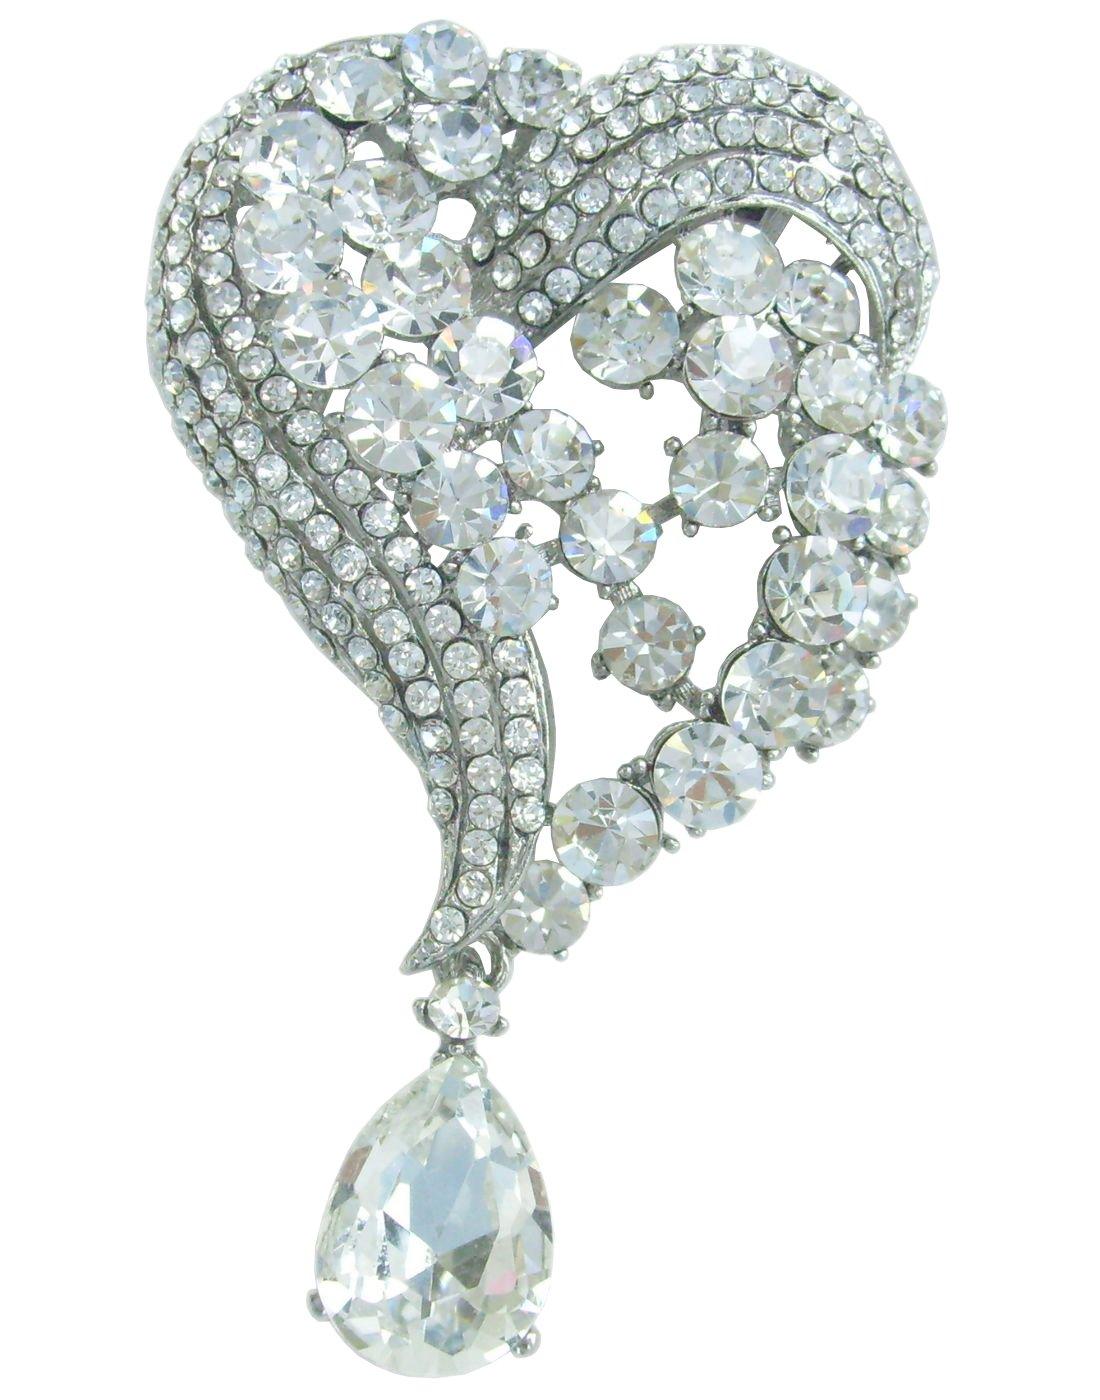 Sindary Wedding 3.15'' Silver-tone Clear Rhinestone Crystal Love Heart Brooch Pin Pendant